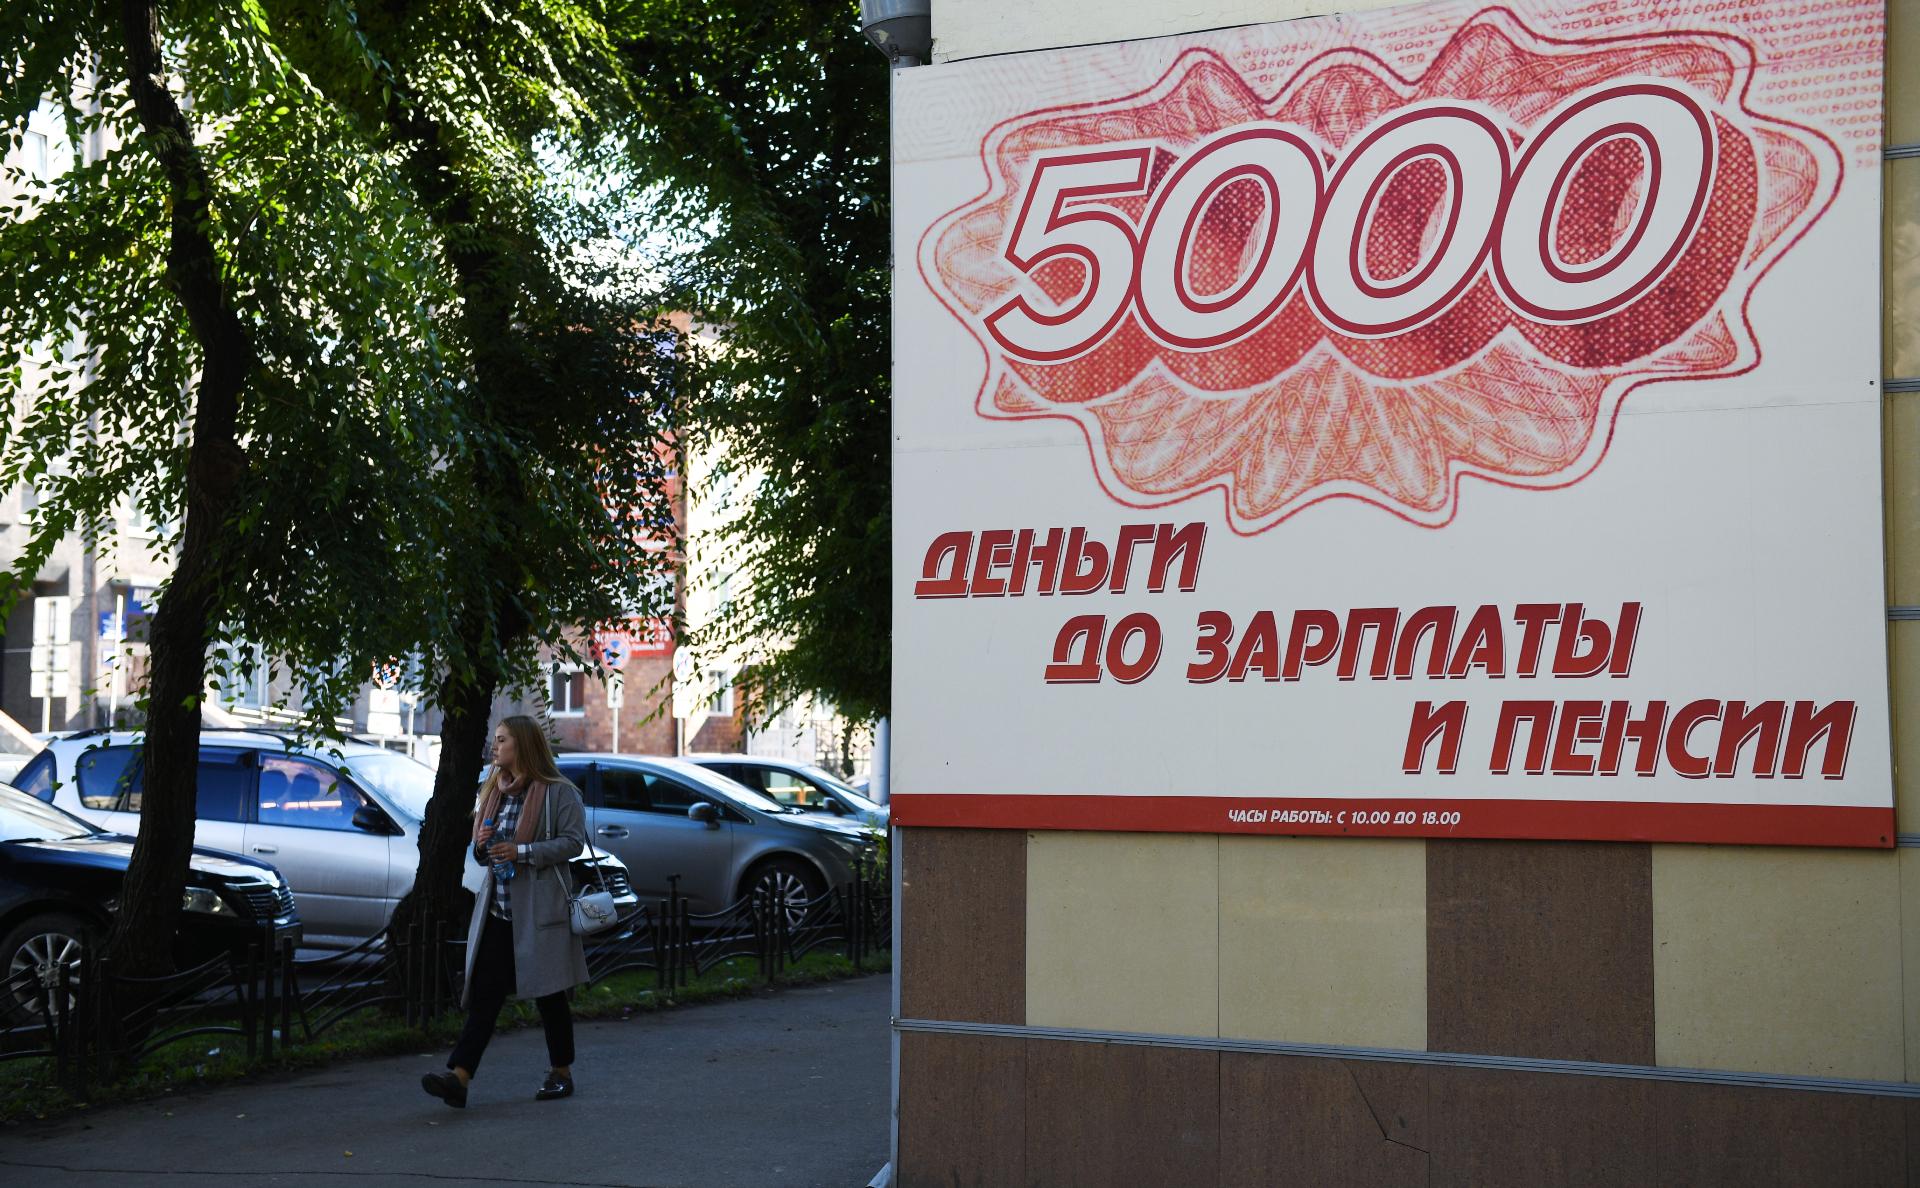 Фото:РИА Новости / Александр Кряжев